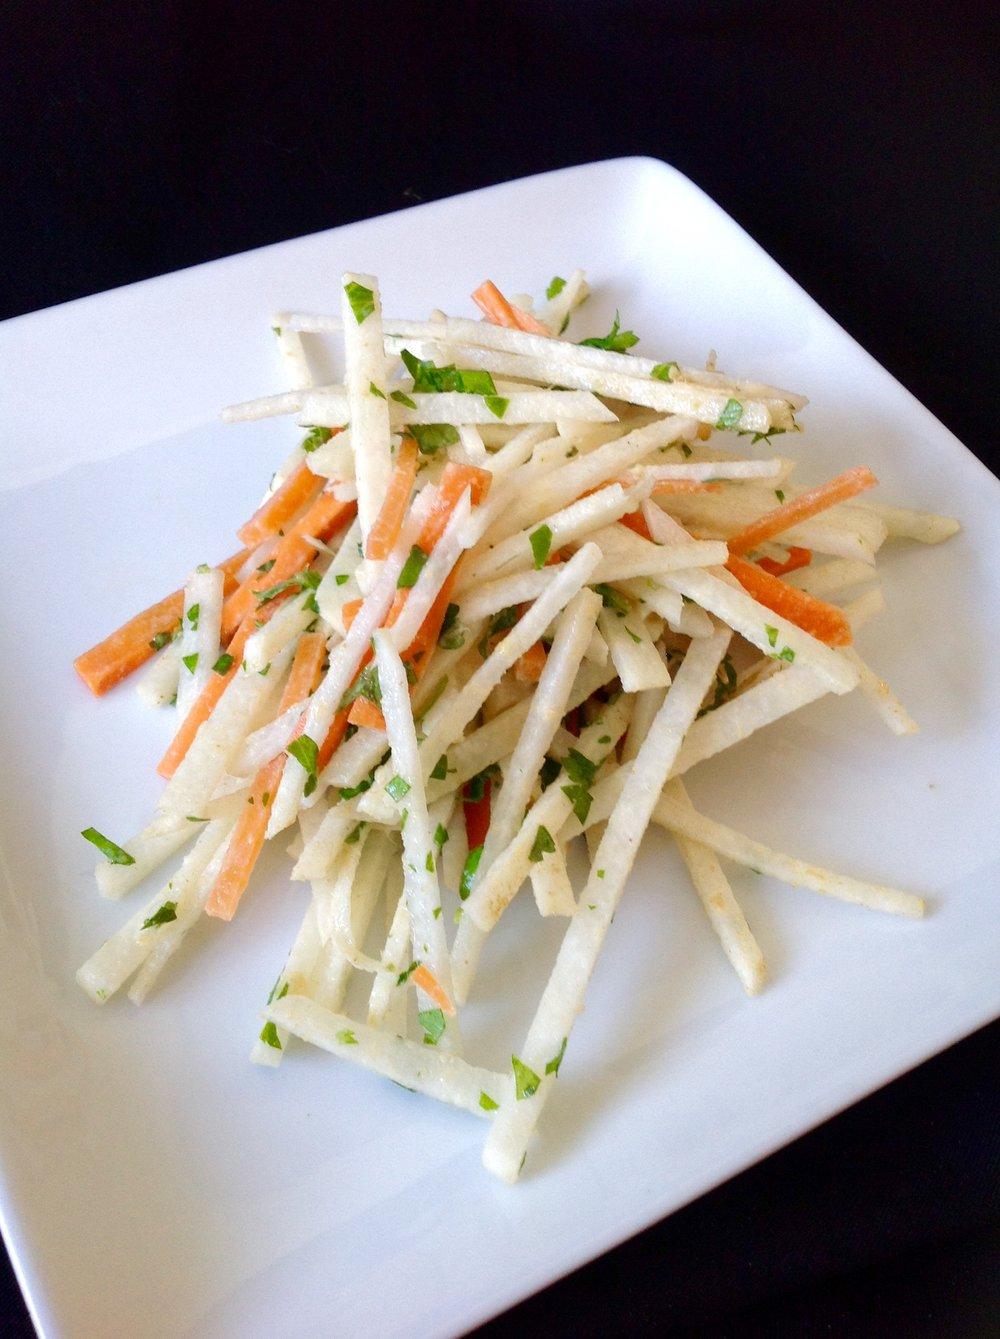 Jicama Cilantro Slaw - Healthy, Plant-Based, Oil-Free, Vegan, Gluten-Free, Fat-Free, Paleo